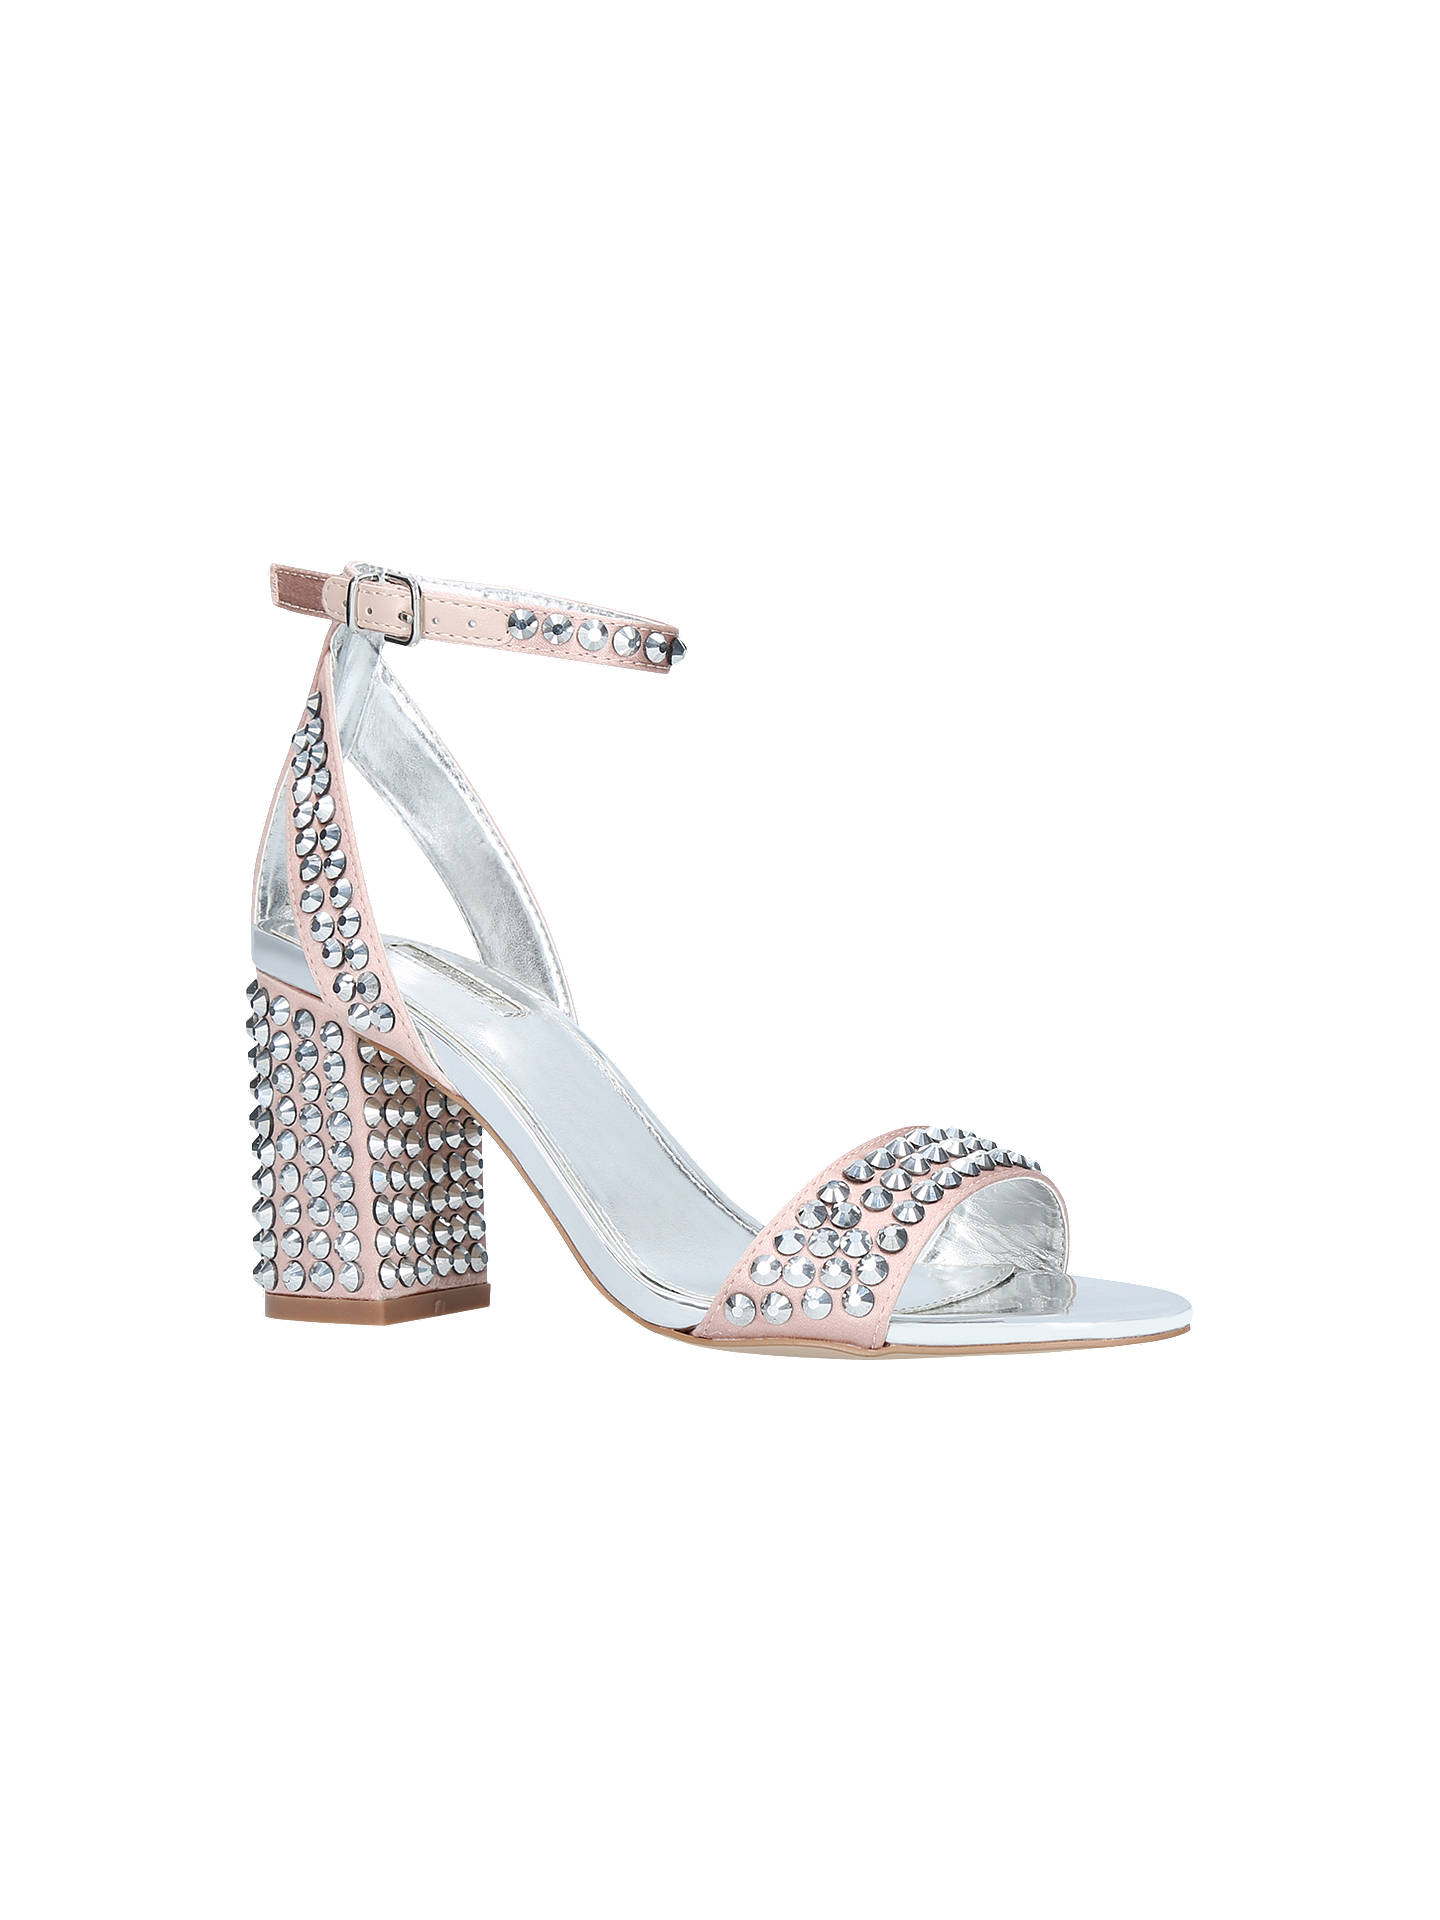 d090fd178fd Carvela Gianni Studded Block Heeled Sandals at John Lewis   Partners